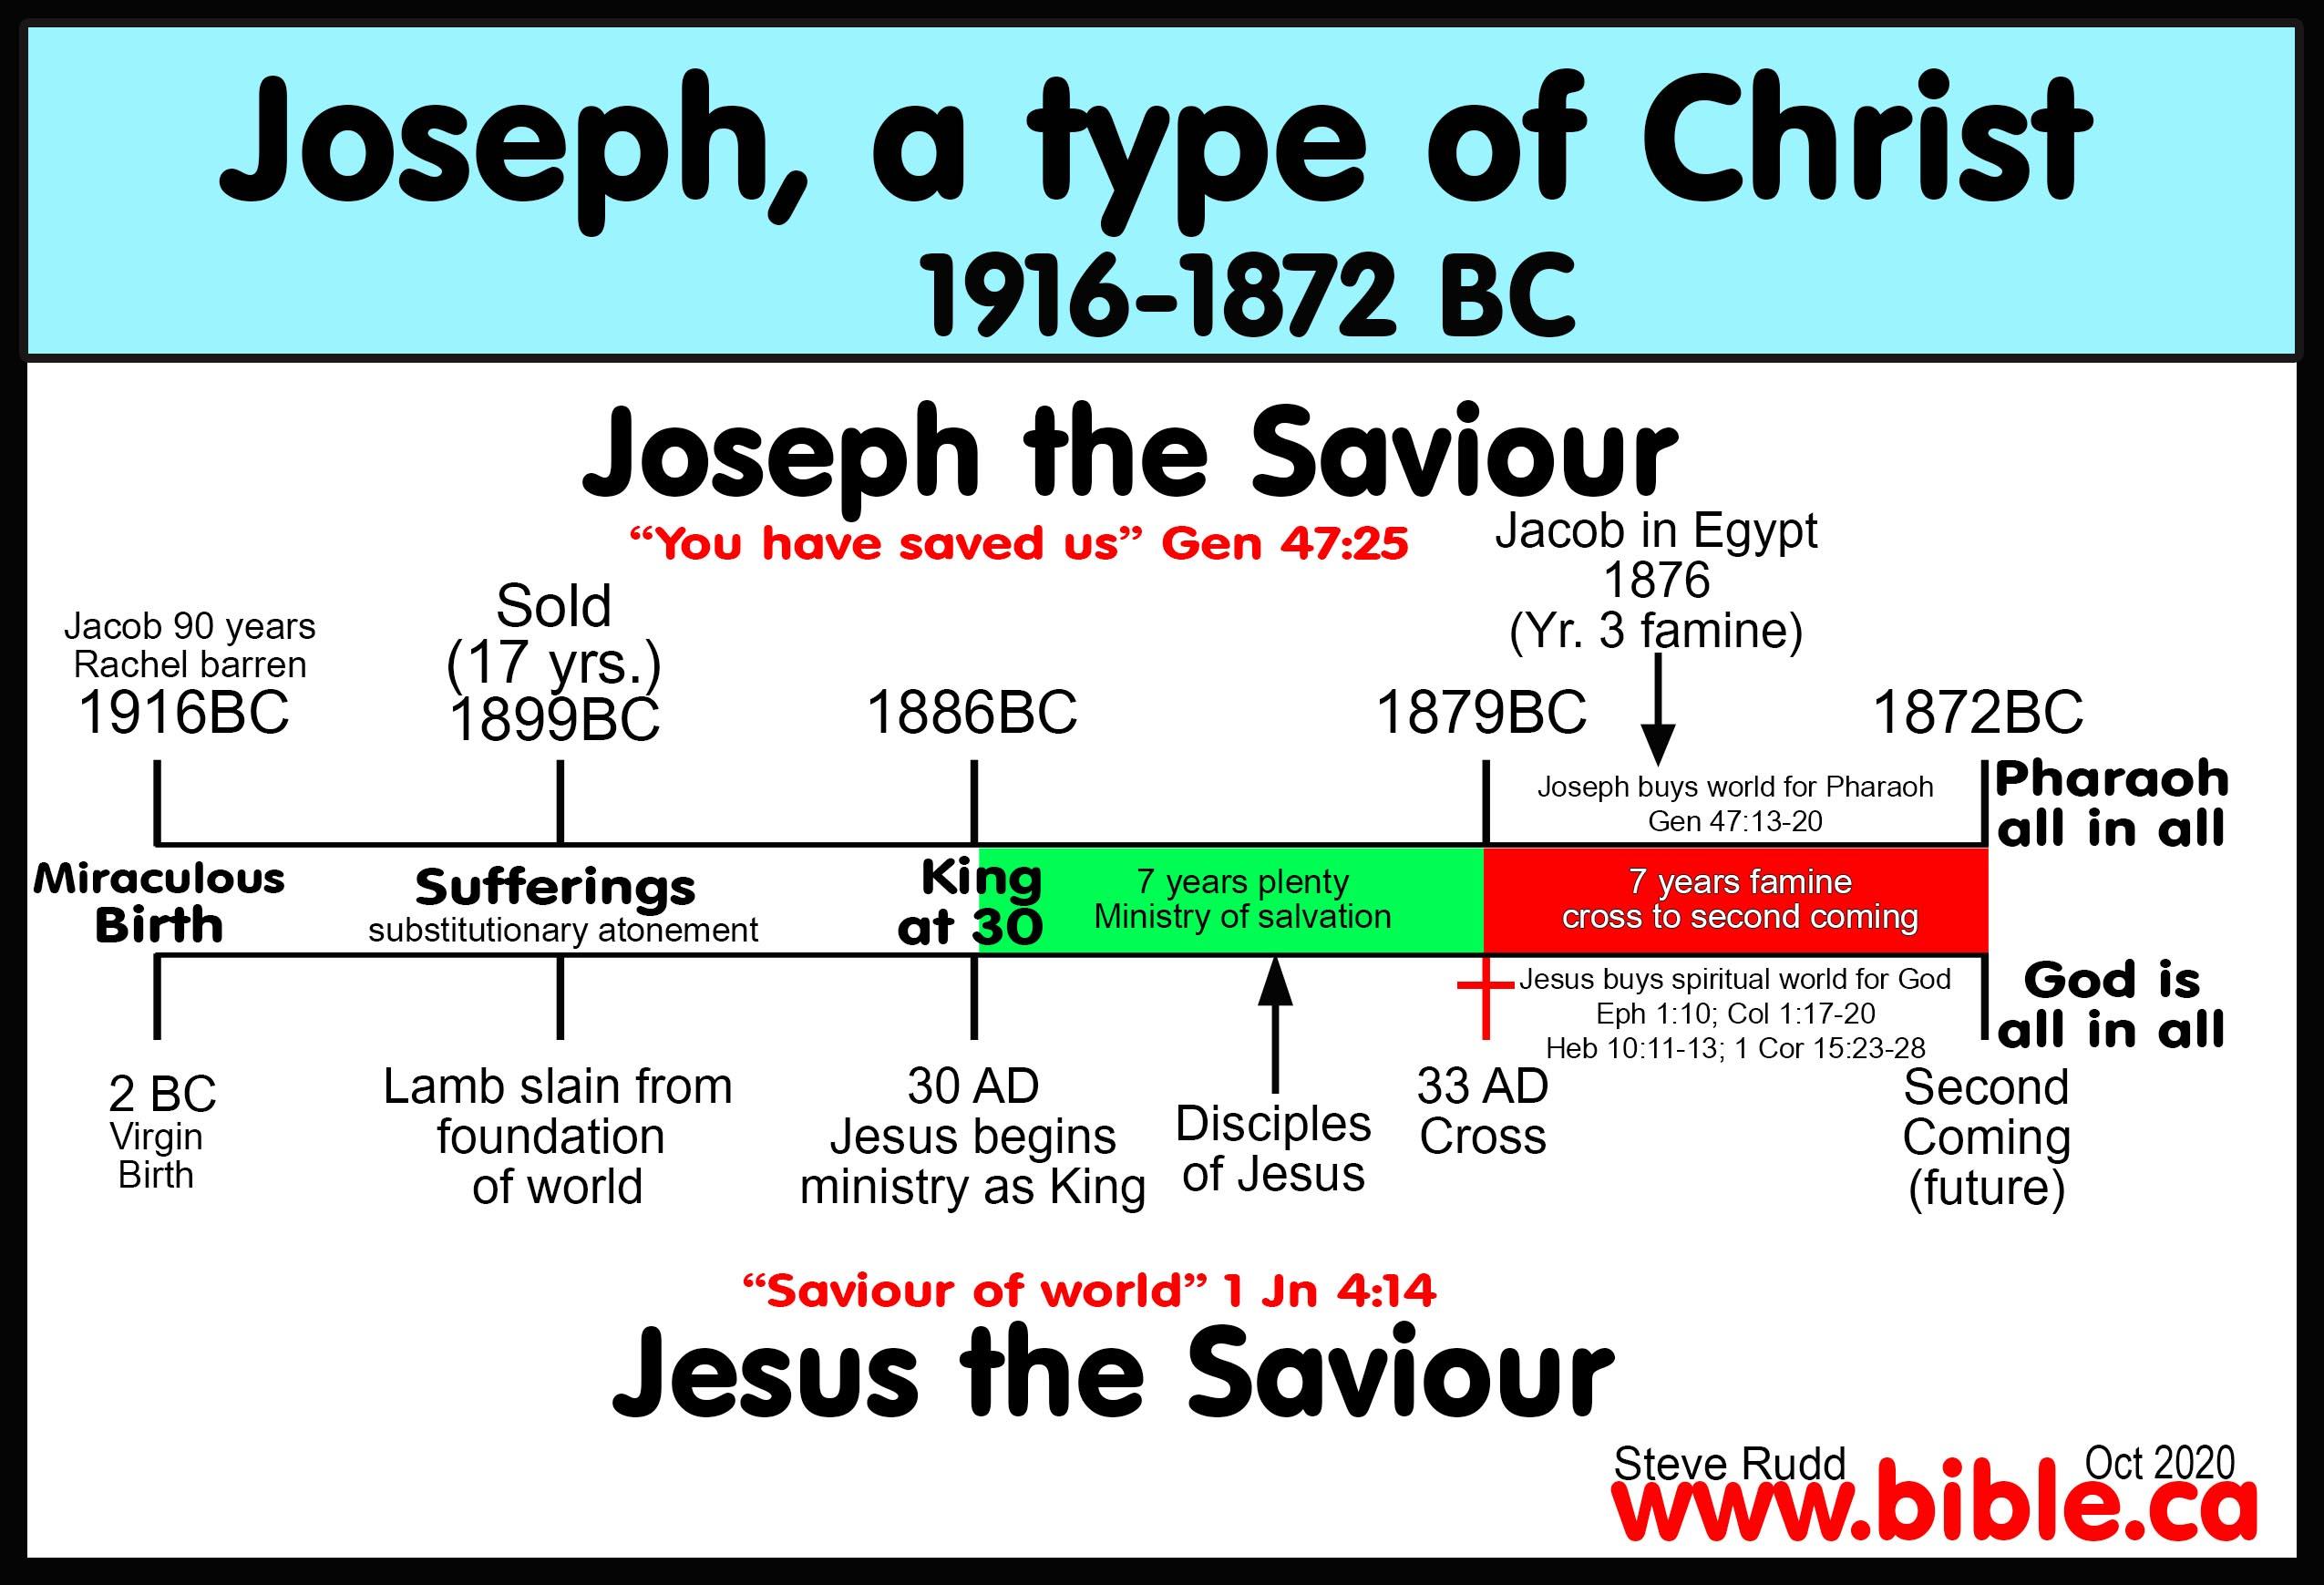 Comparison List Of 75 Joseph Christ Shadows Types Antitypes And Similarities